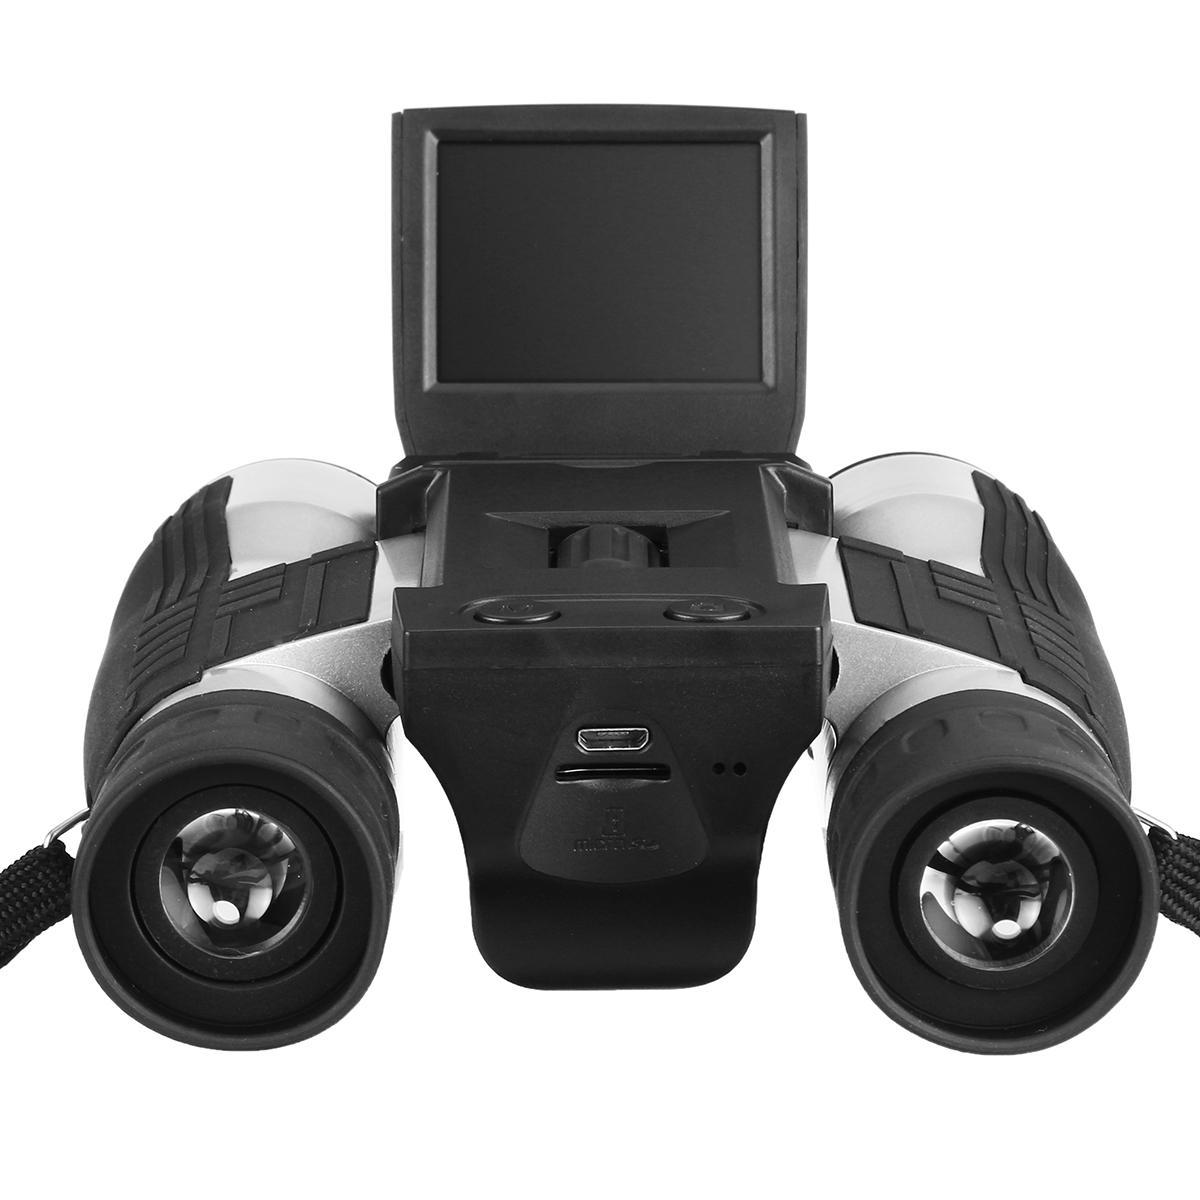 1080P HD Dijital Kamera 12X Zoom Teleskop Dürbün Video Oynatma 2 inç LCD Dürbün